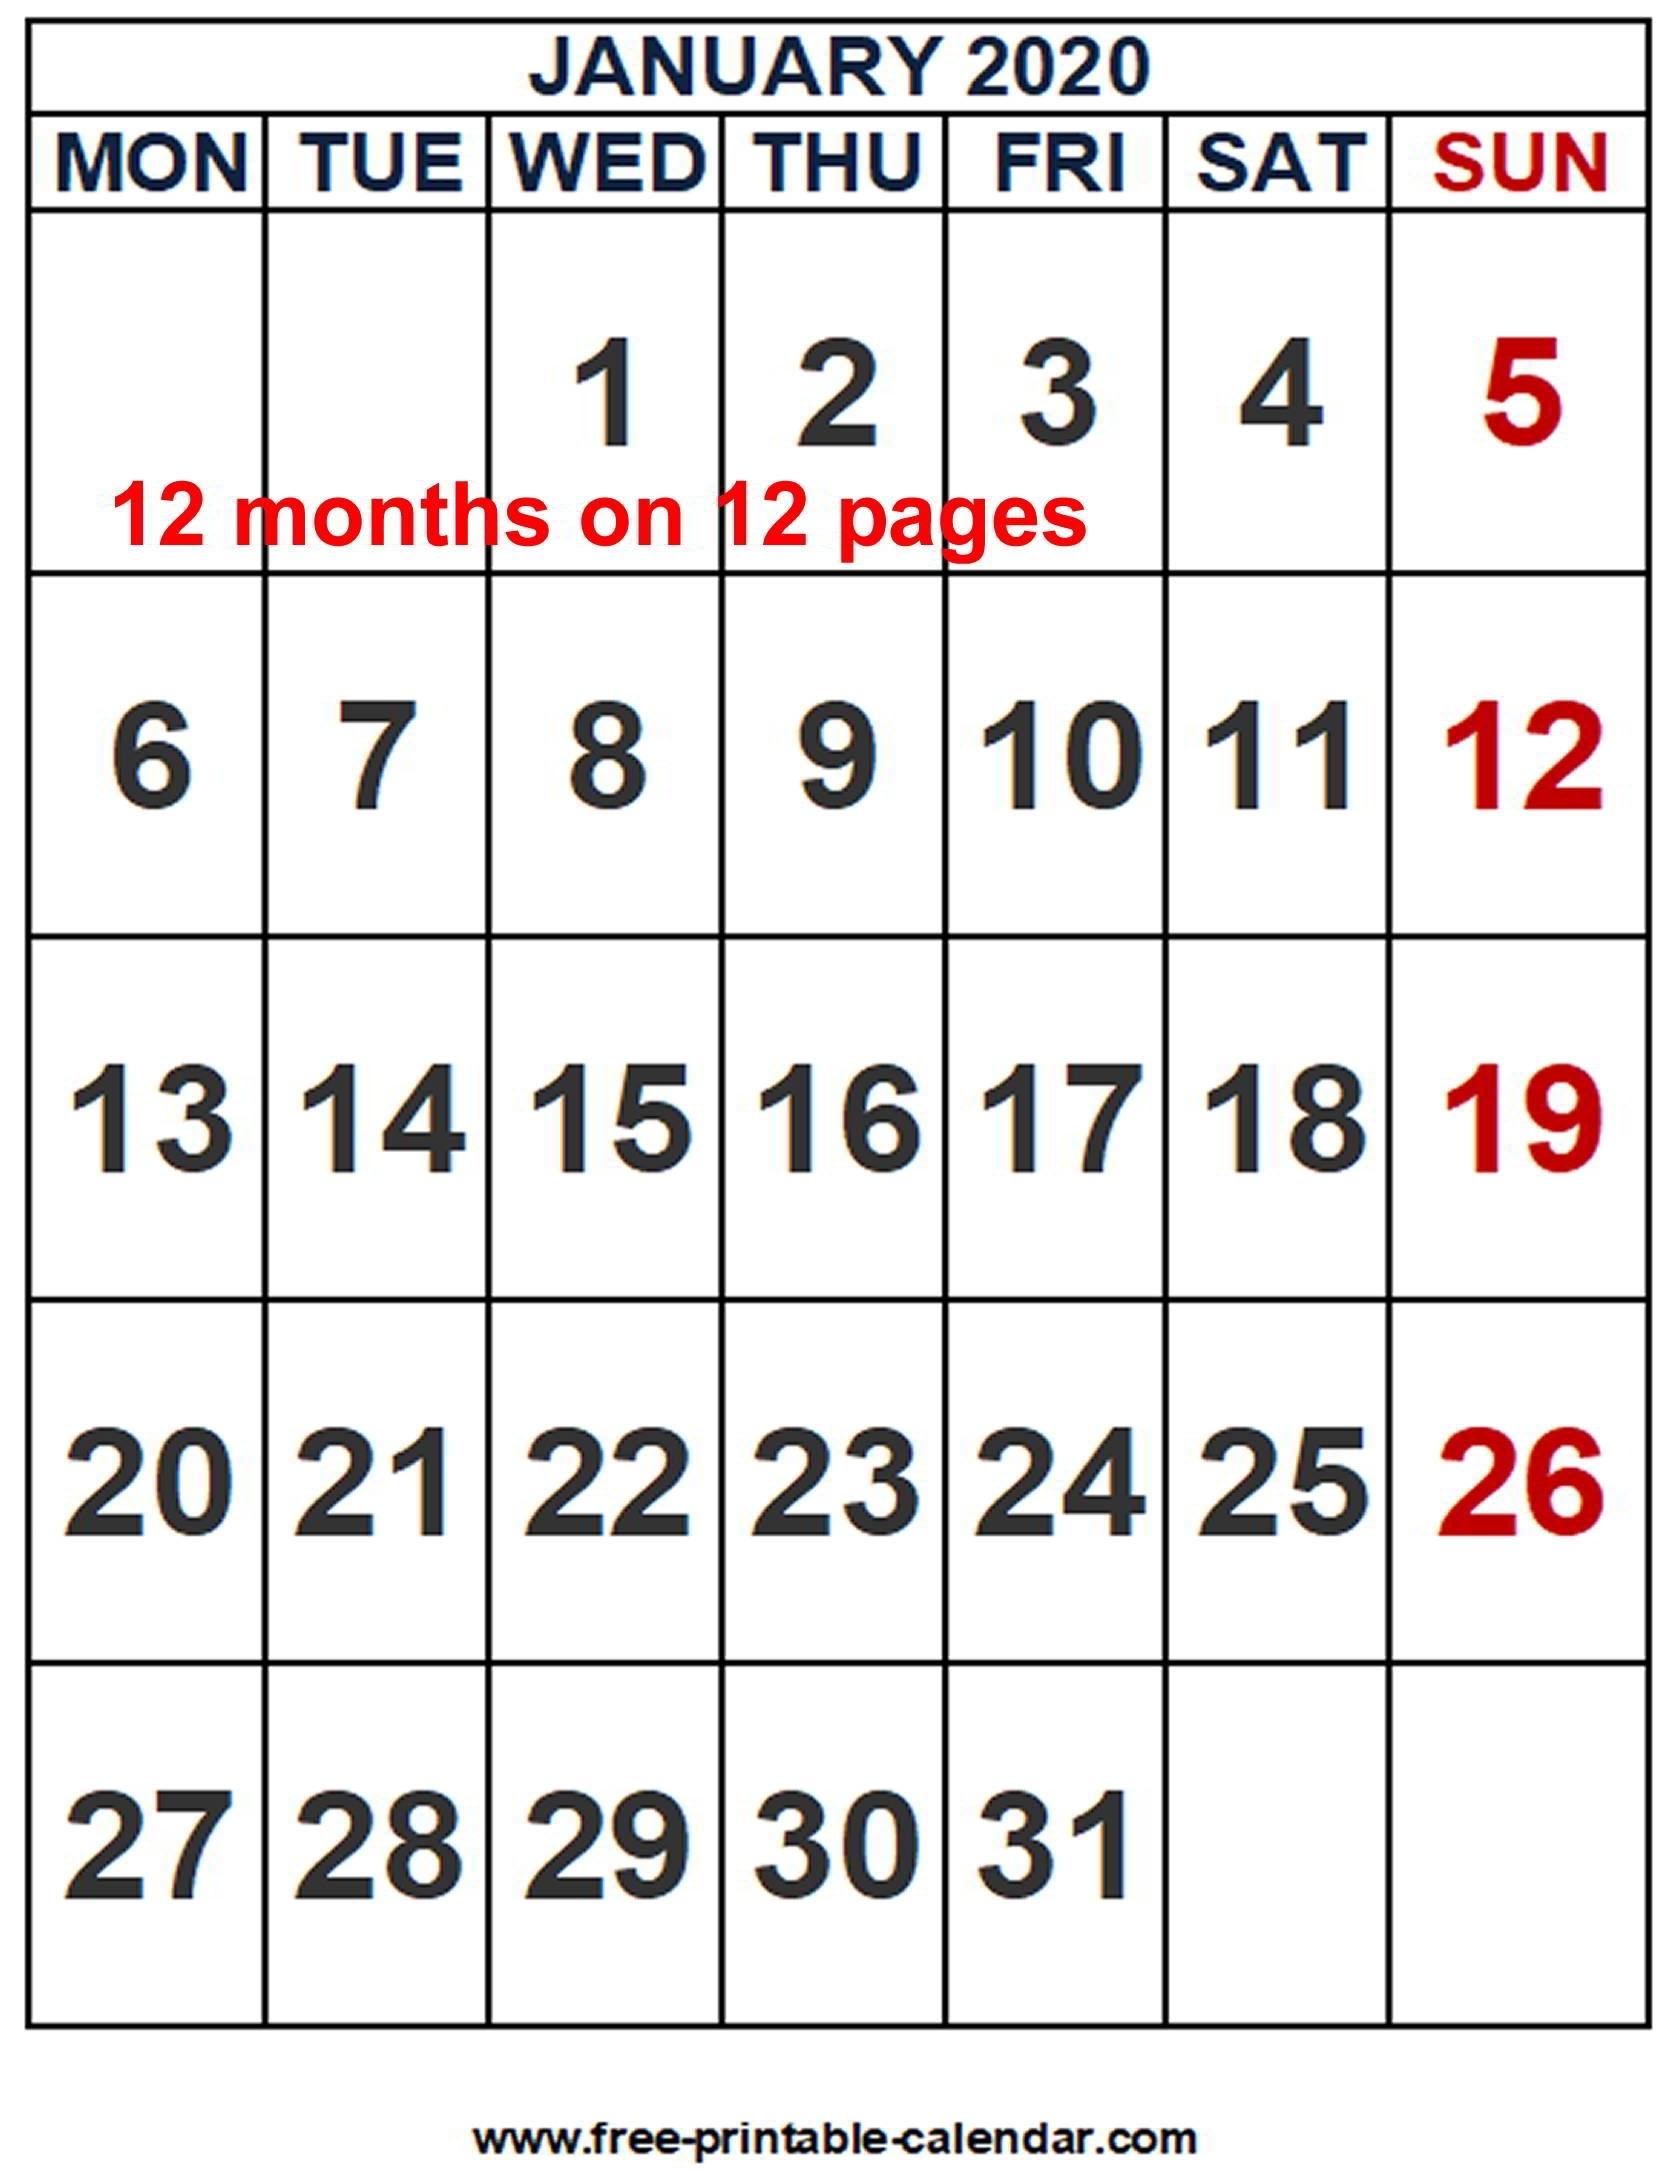 2020 Calendar Word Template - Free-Printable-Calendar